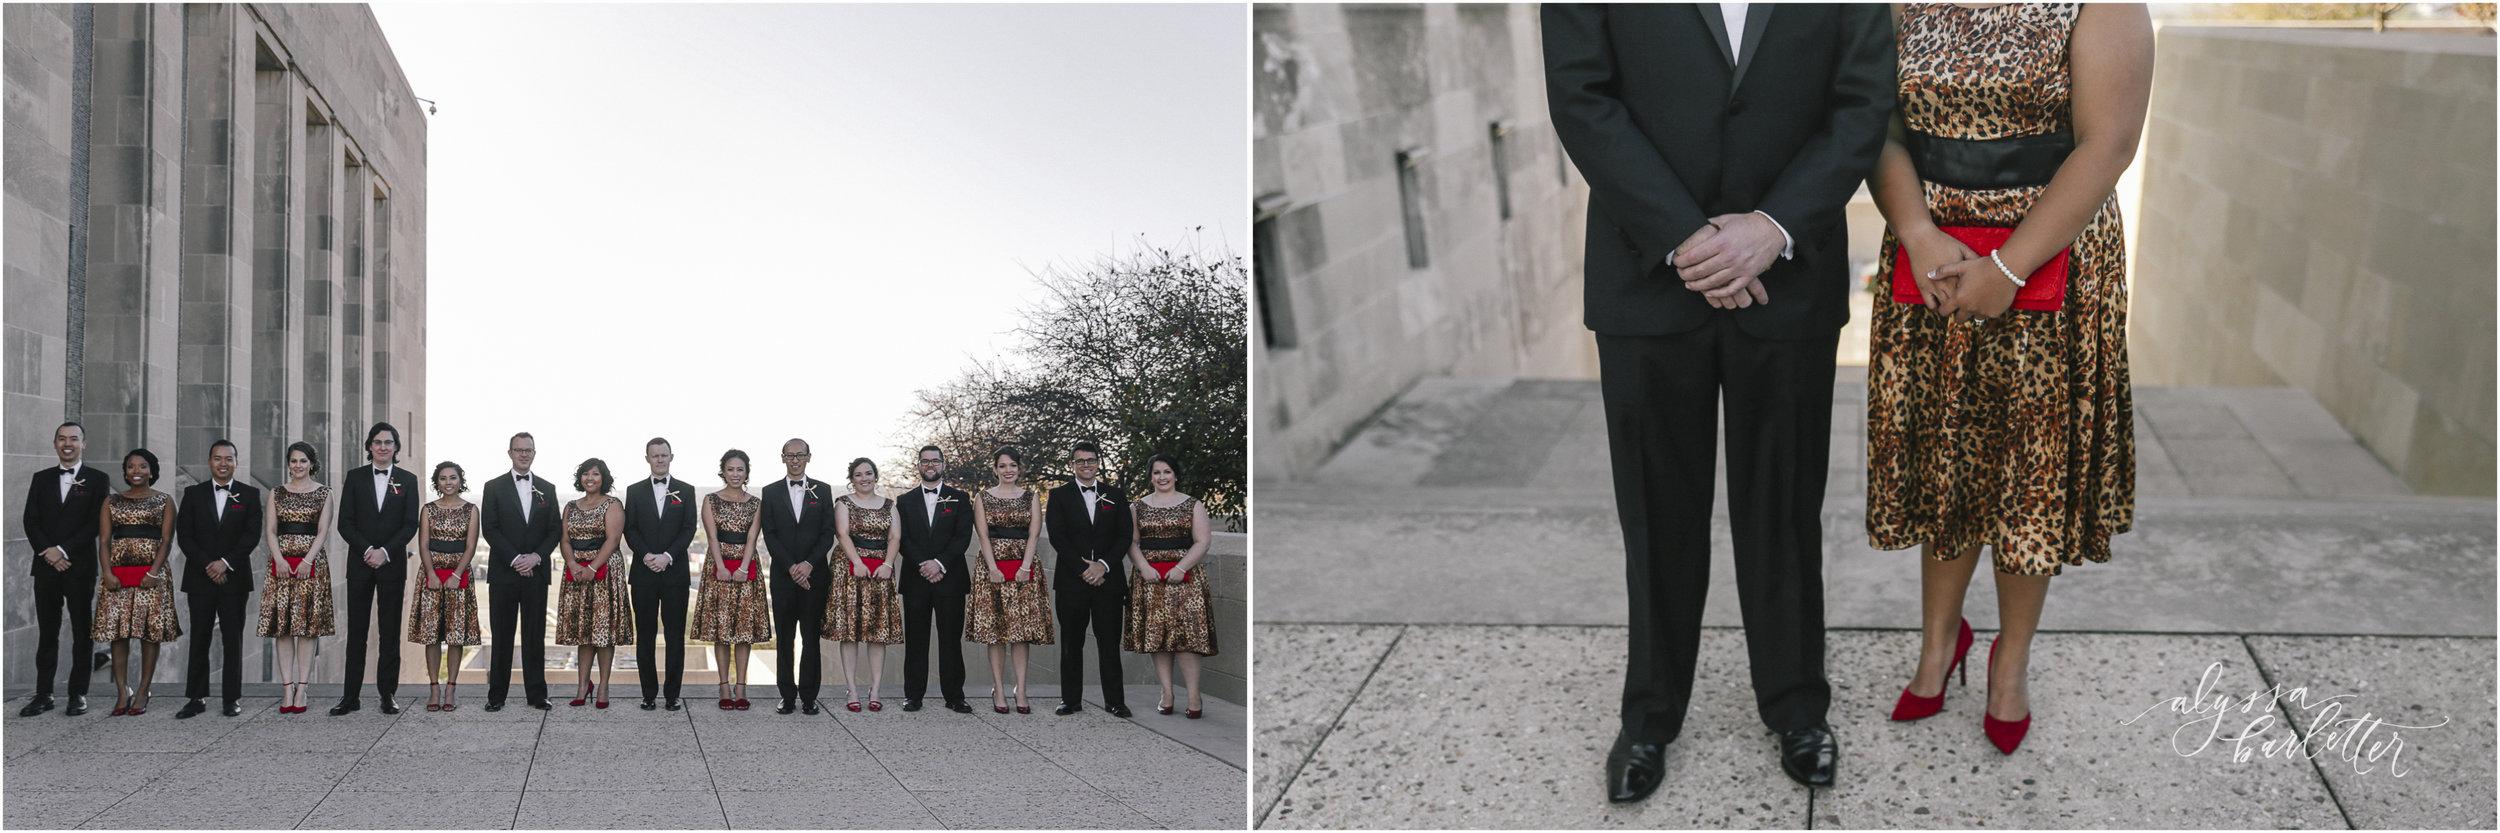 alyssa barletter photography union station wedding photos leopard print winter wedding-1-31.jpg